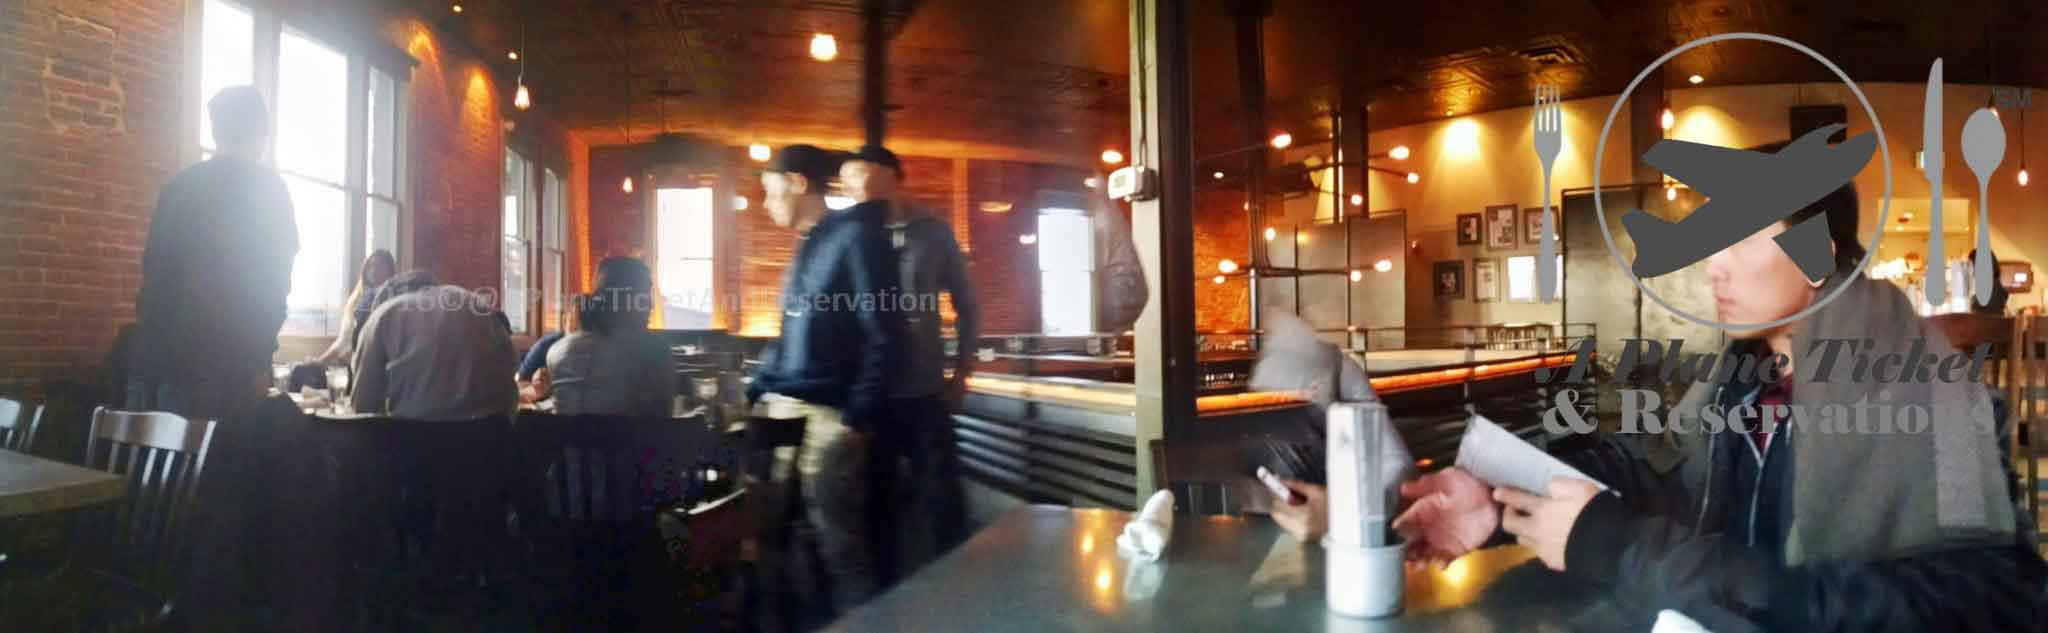 Euclid Hall Bar & Kitchen Denver